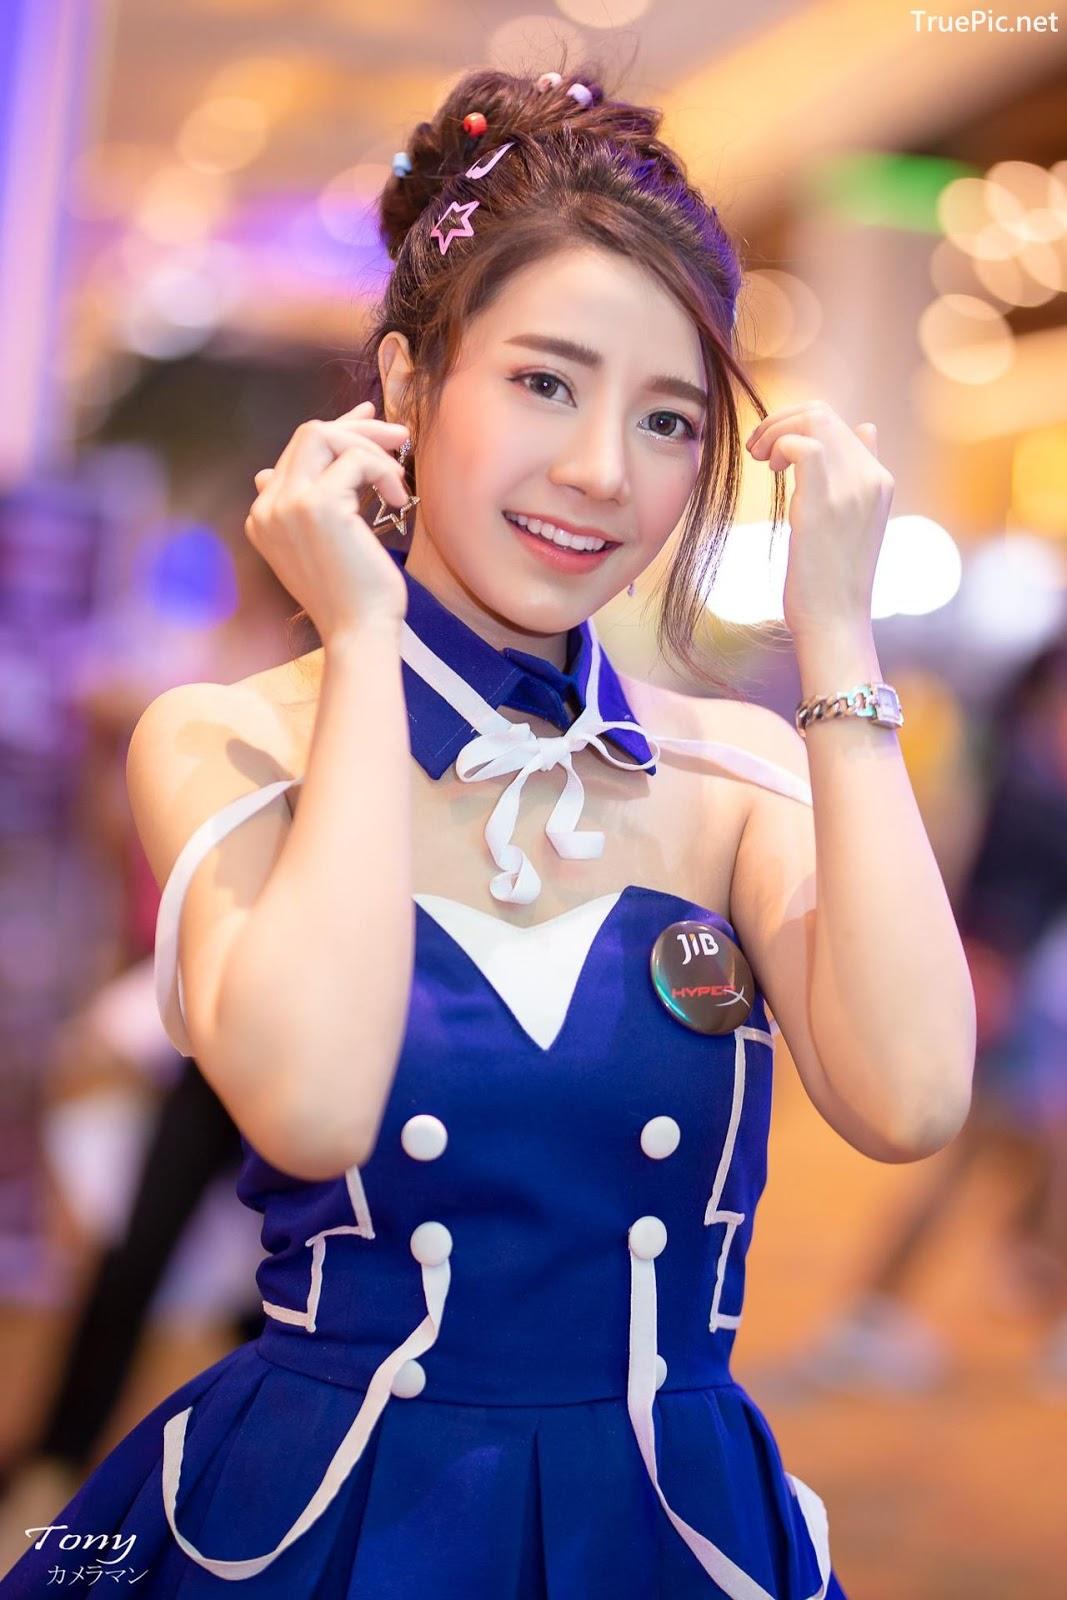 Image-Thailand-Hot-Model-Thai-PG-At-Commart-2018-TruePic.net- Picture-16